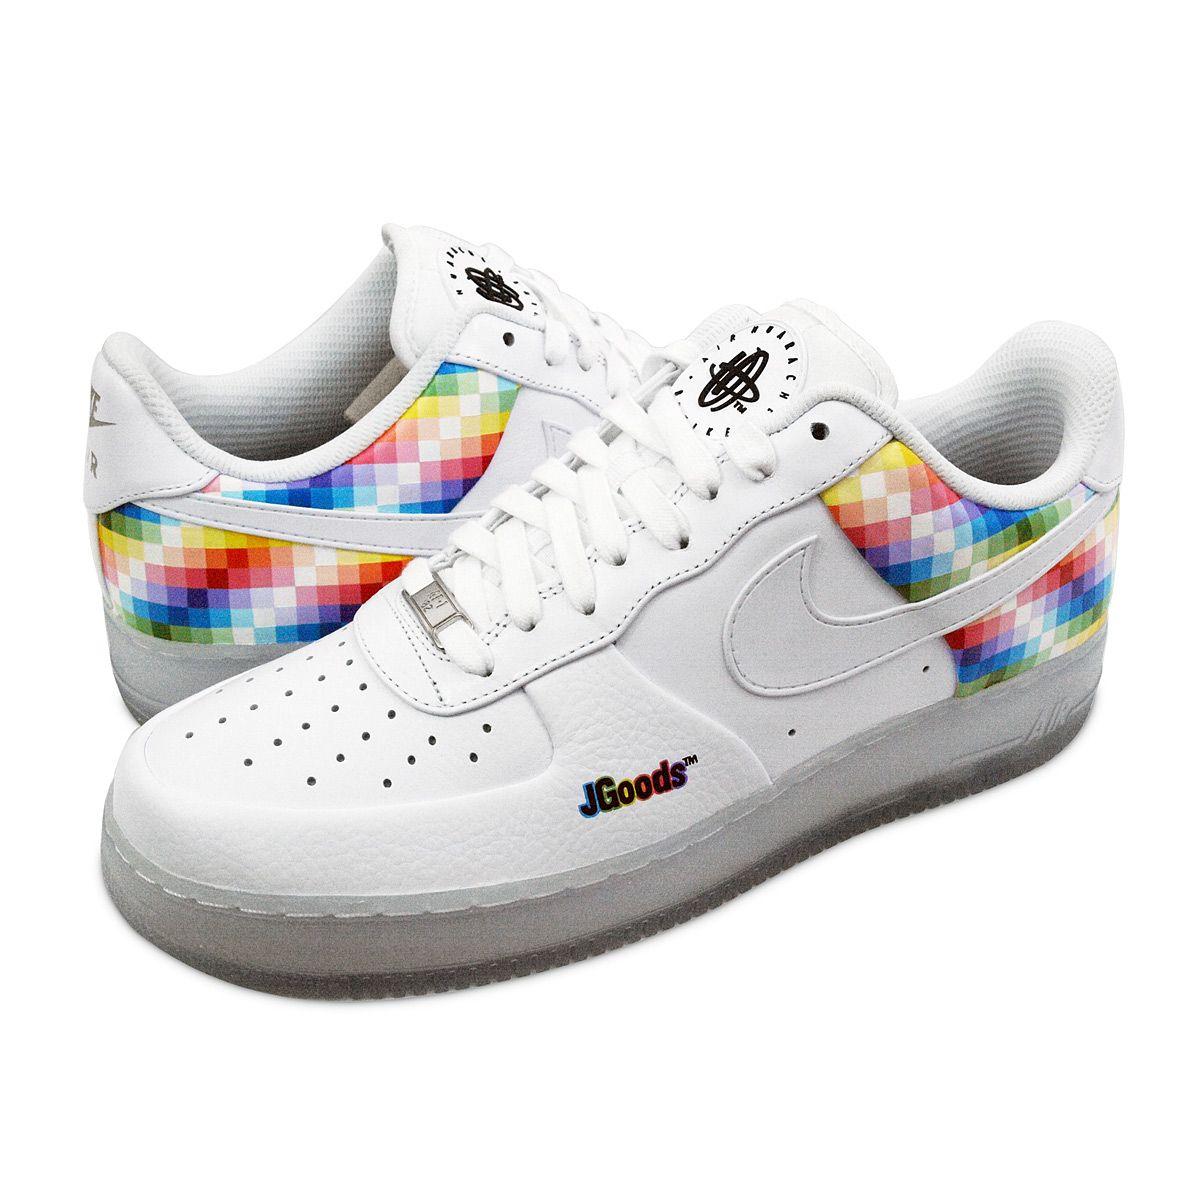 Sneaker Painting Kit, Coloring